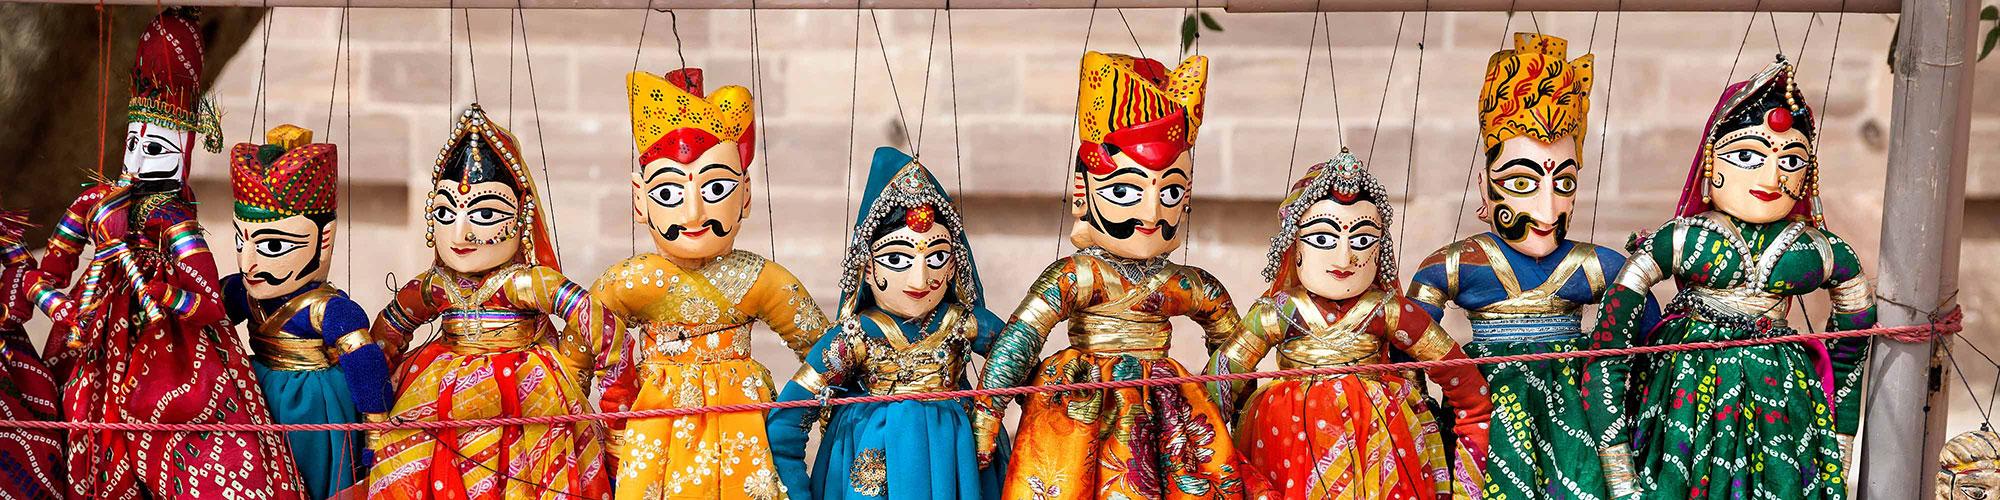 Indian Oriya Puppets Orange and Blue